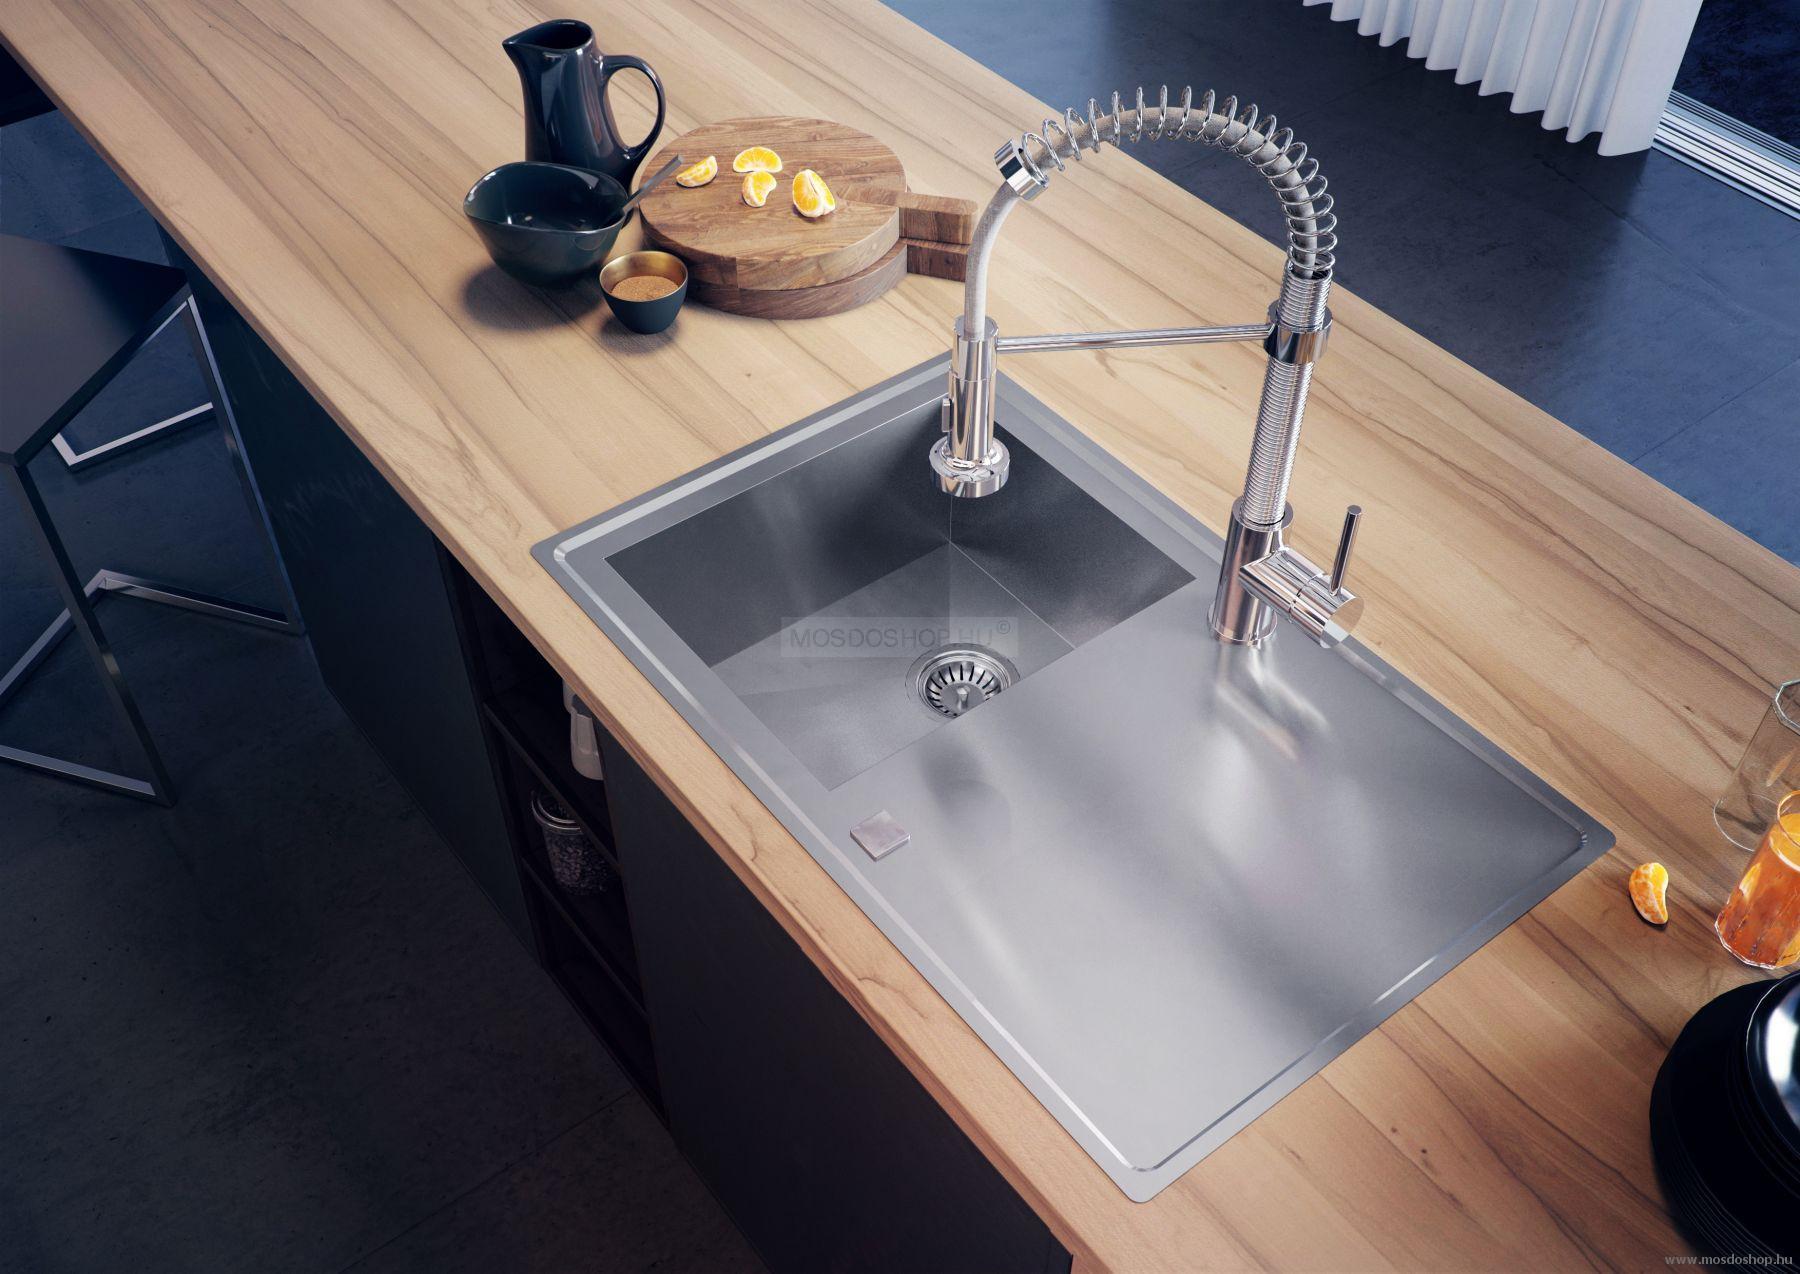 Deante - Molla zuhanyfejes mosogató csap